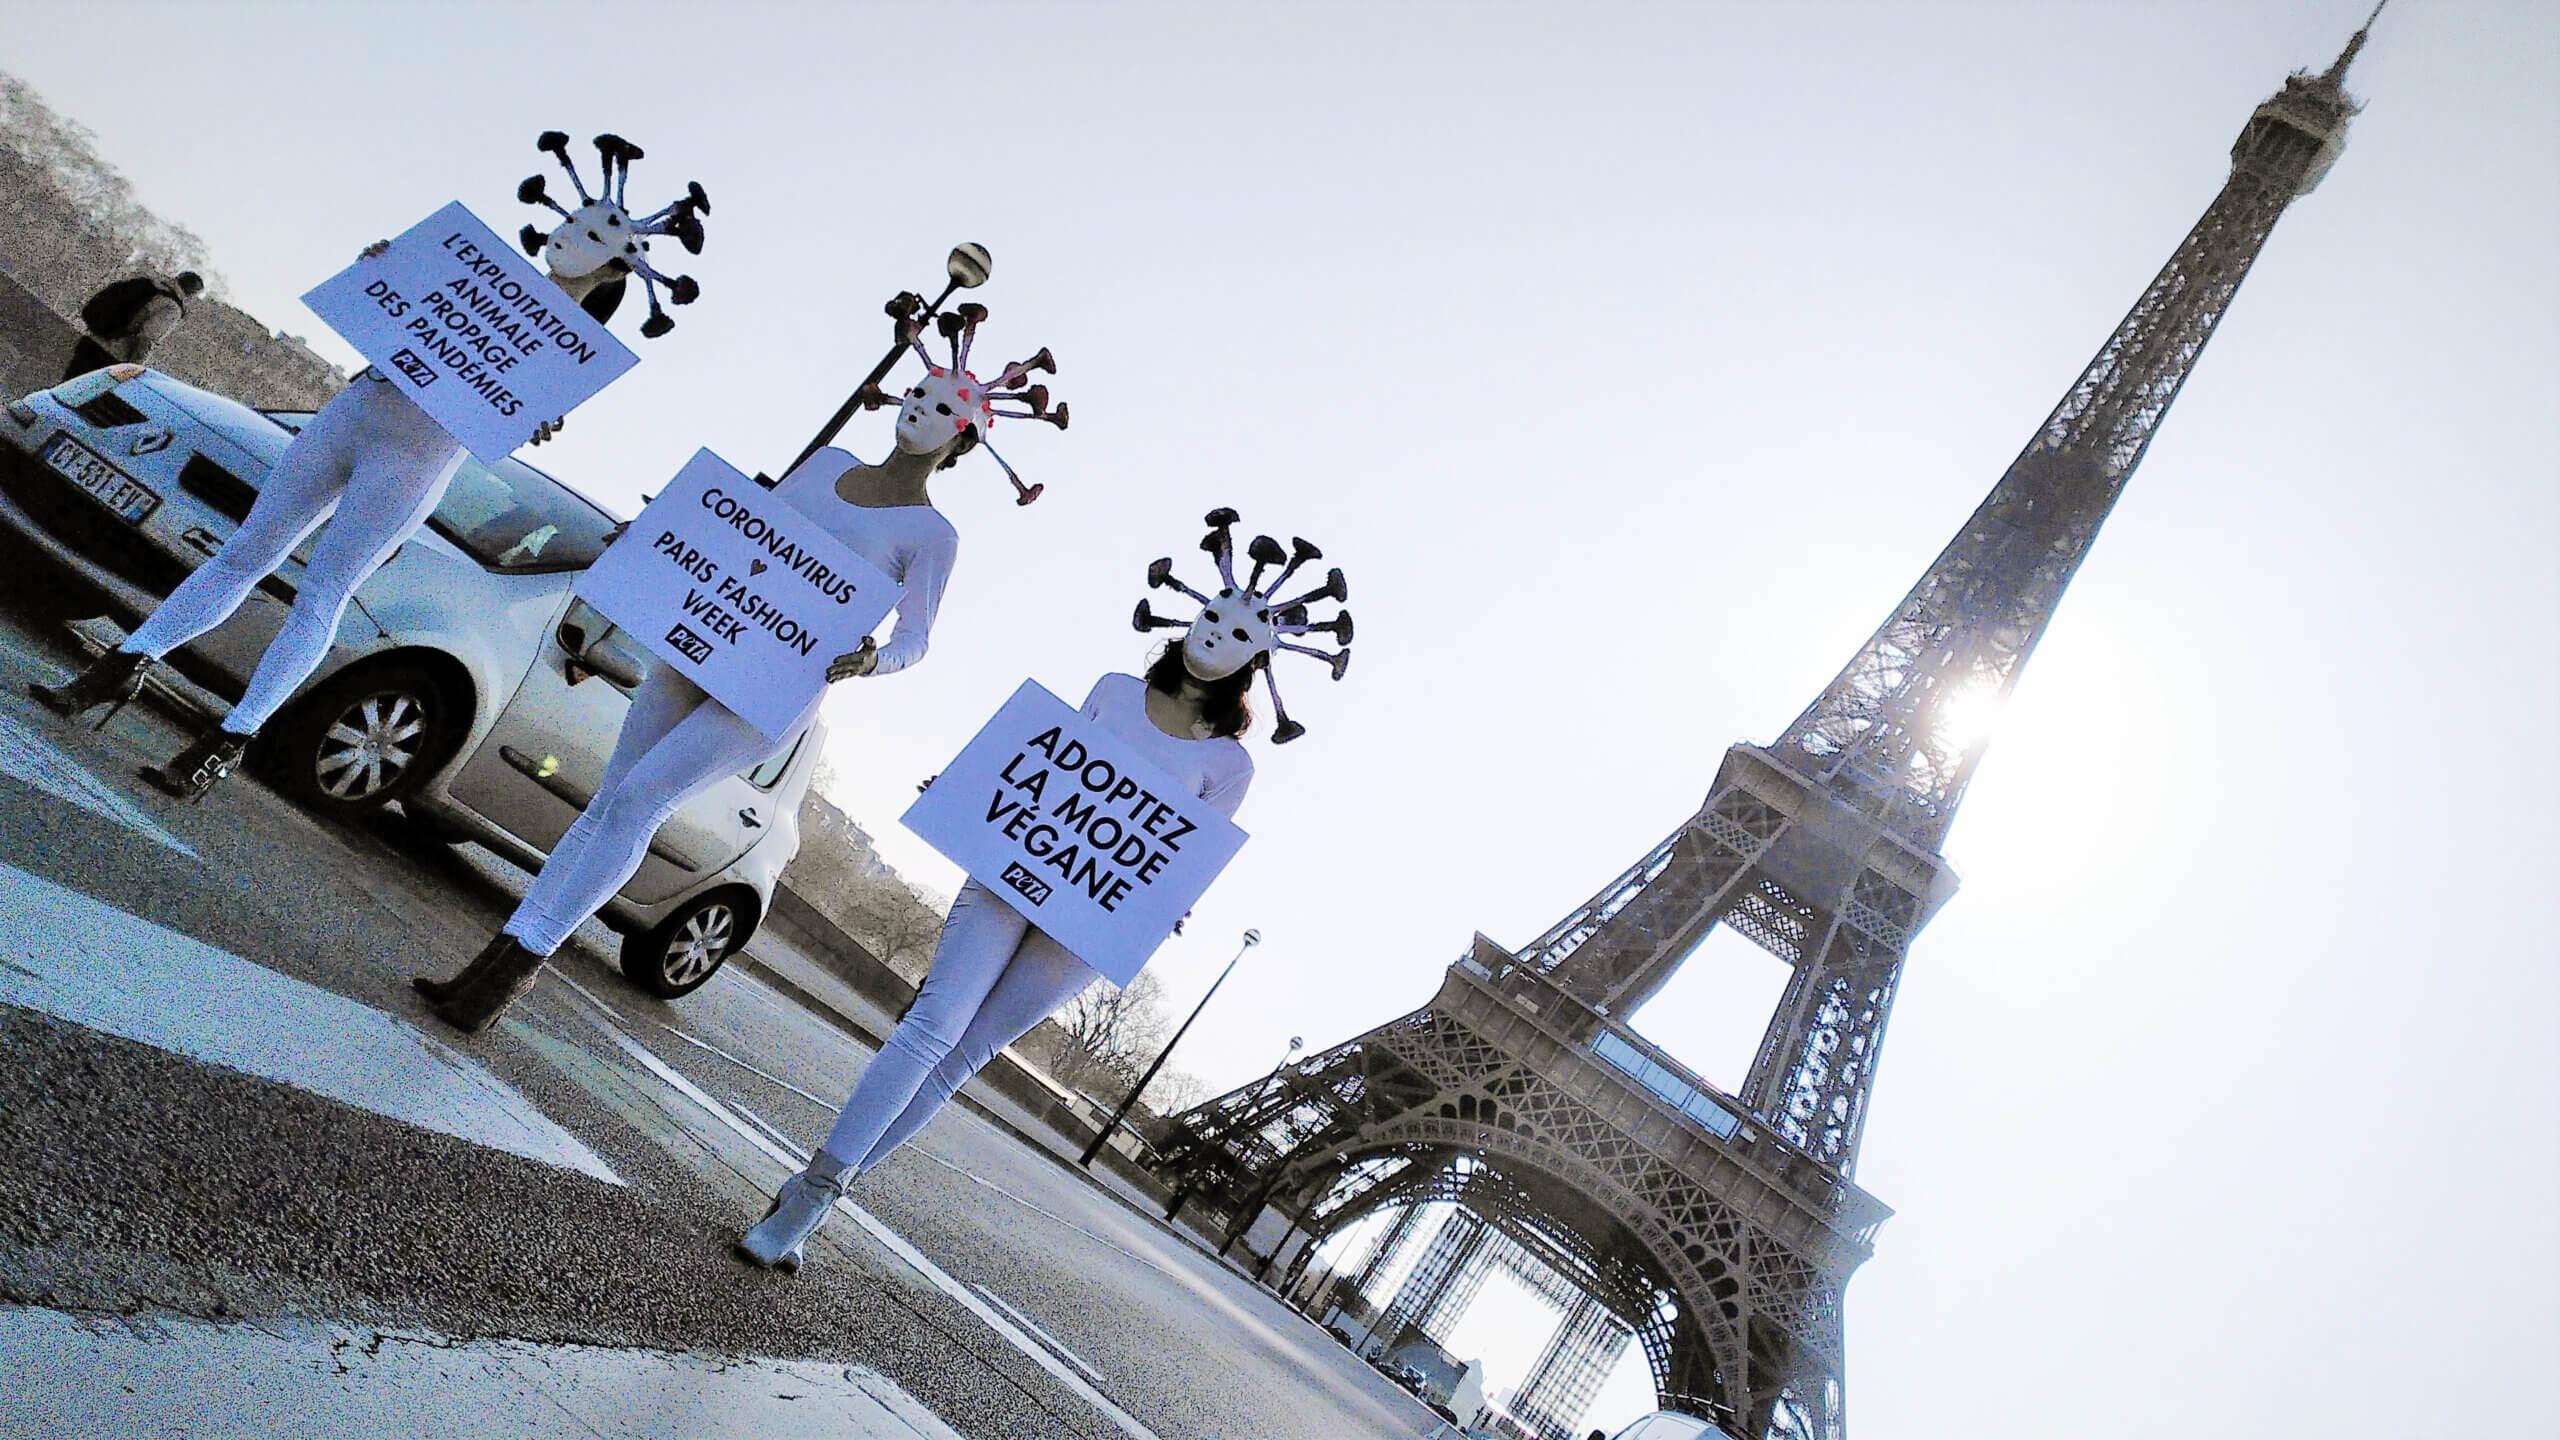 « Le coronavirus aime la Paris Fashion Week » accuse PETA